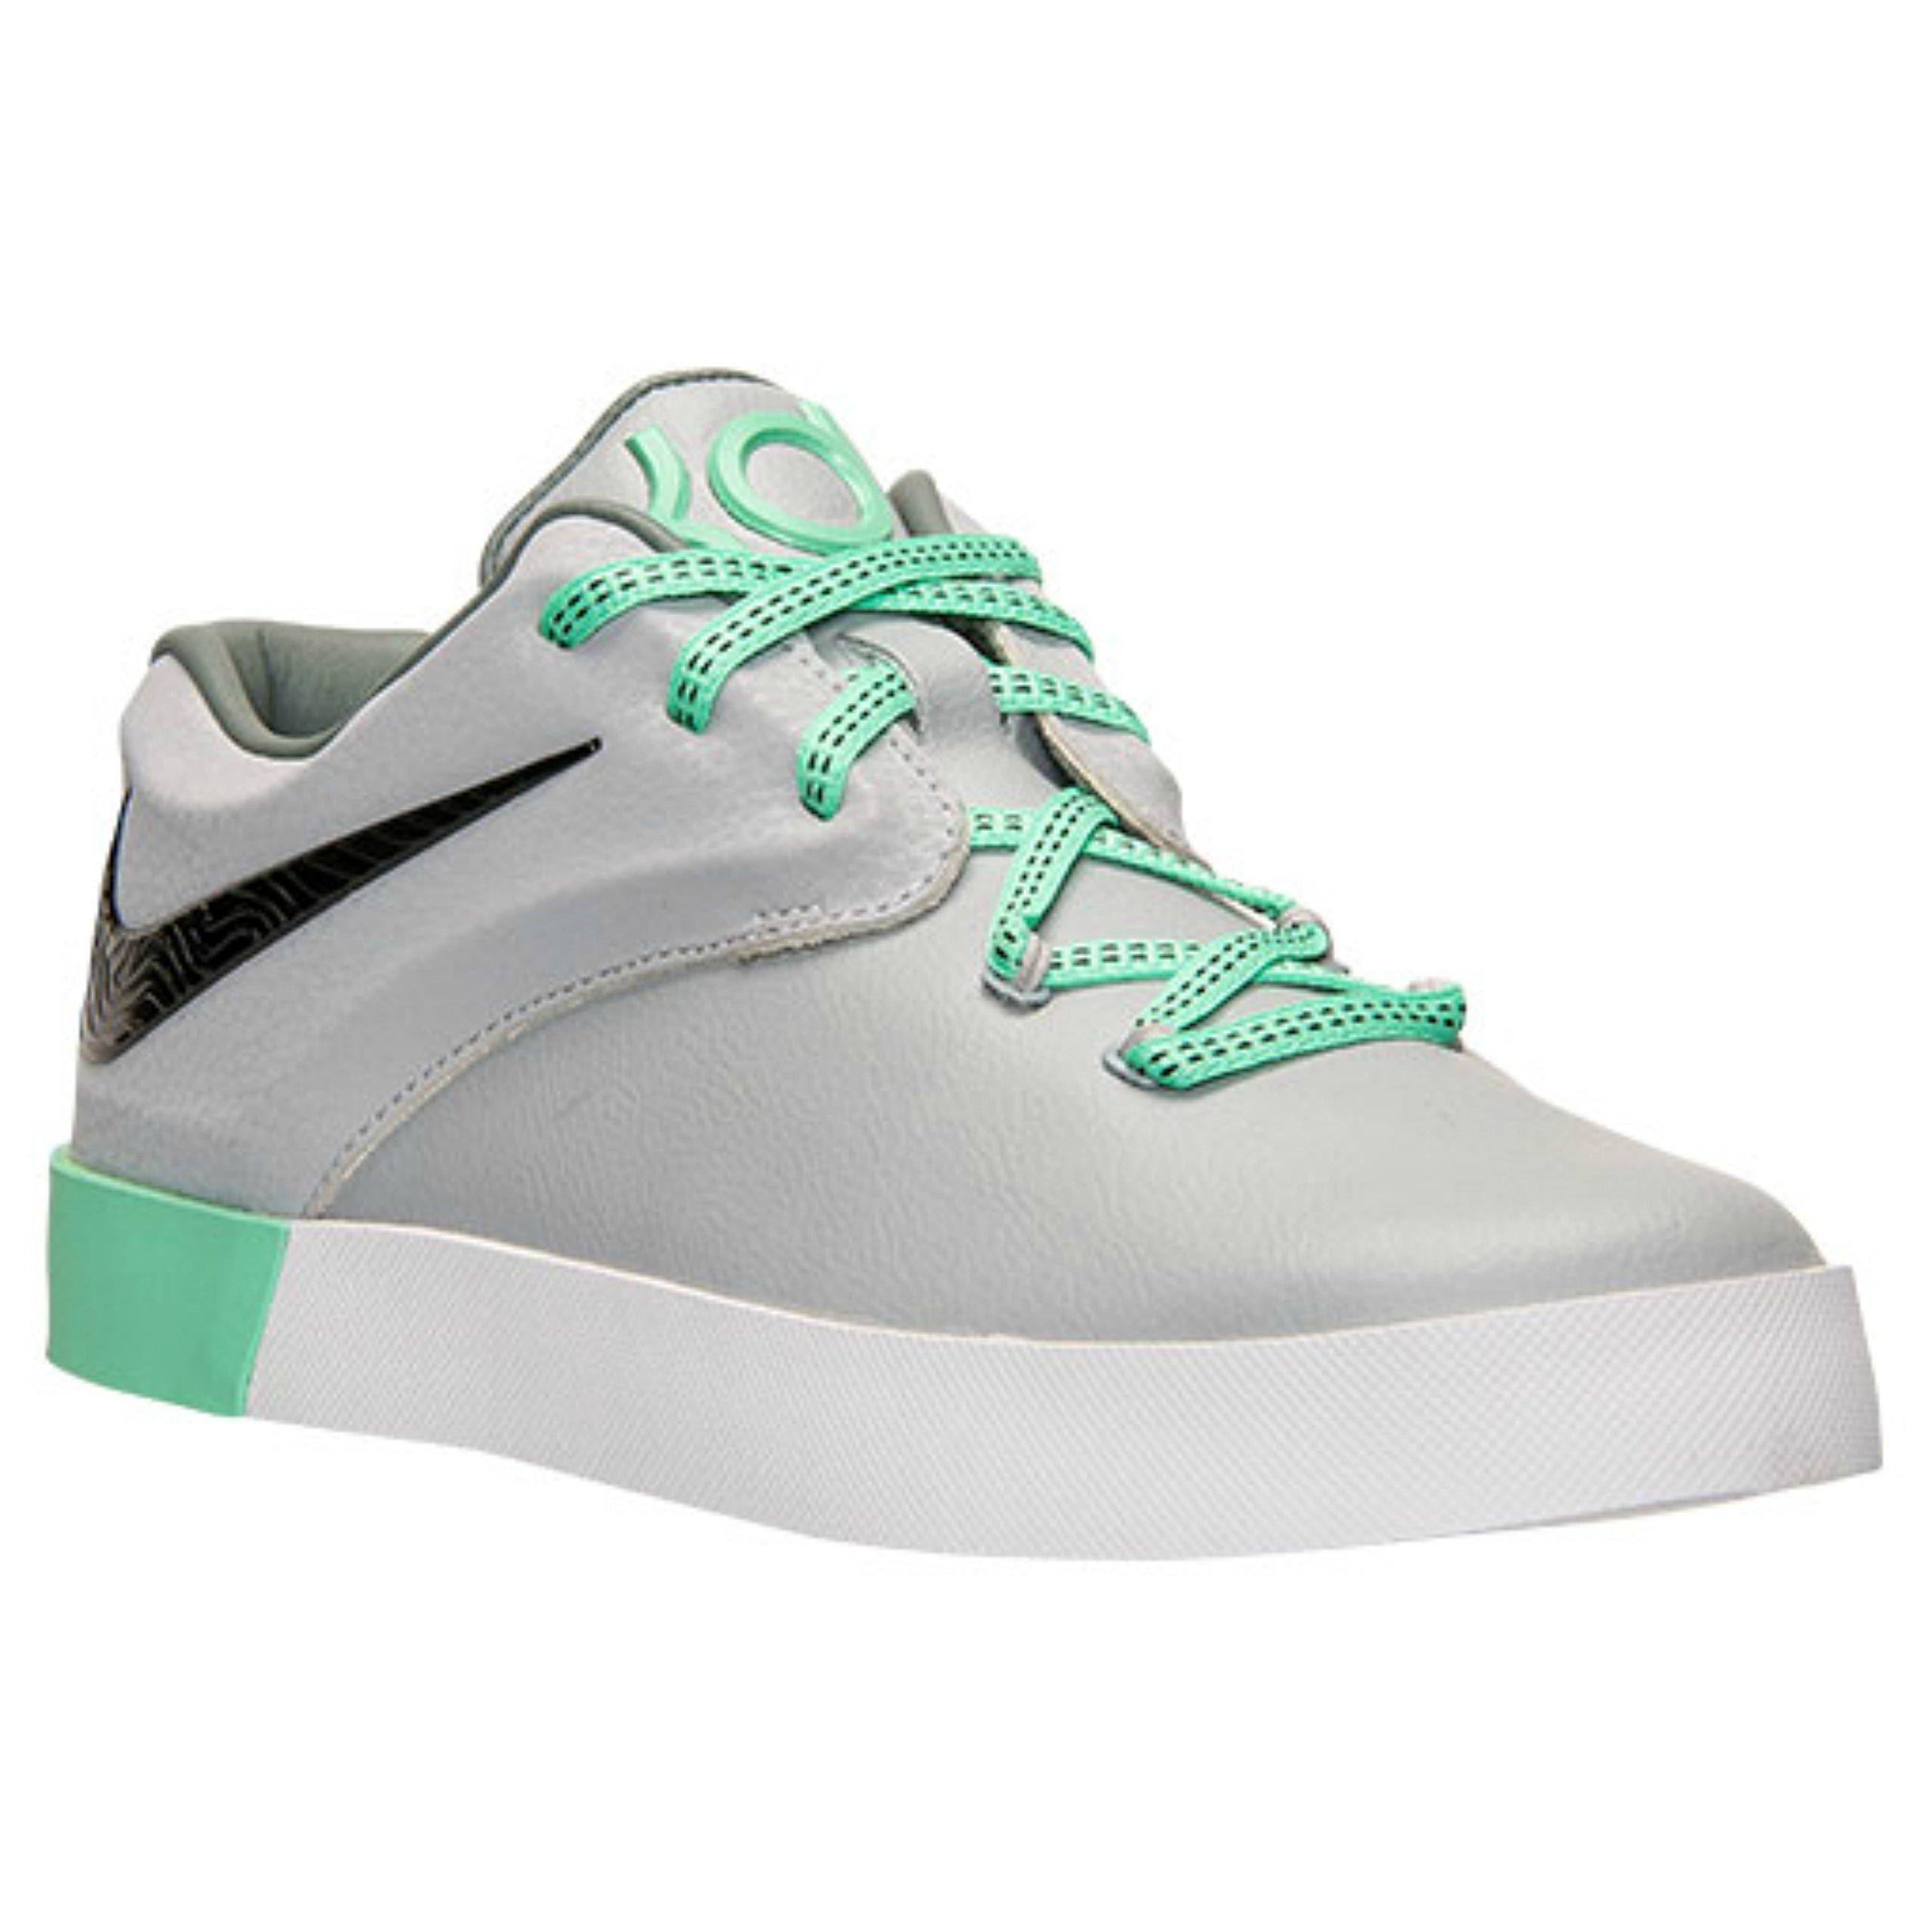 1487be742fb1 Galleon - Nike KD Vulc 2 Basketball Shoes BIG YOUTH Boys Grade School Wolf  Grey (6)